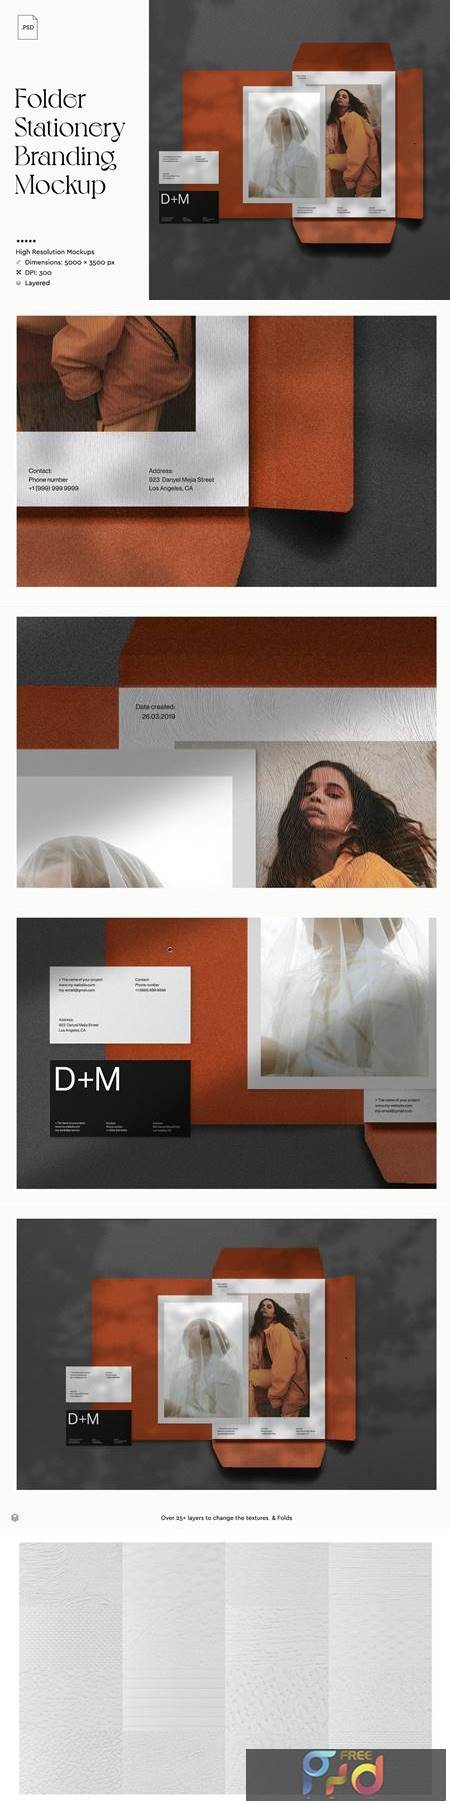 Folder Stationery Branding Mockup 4116781 1